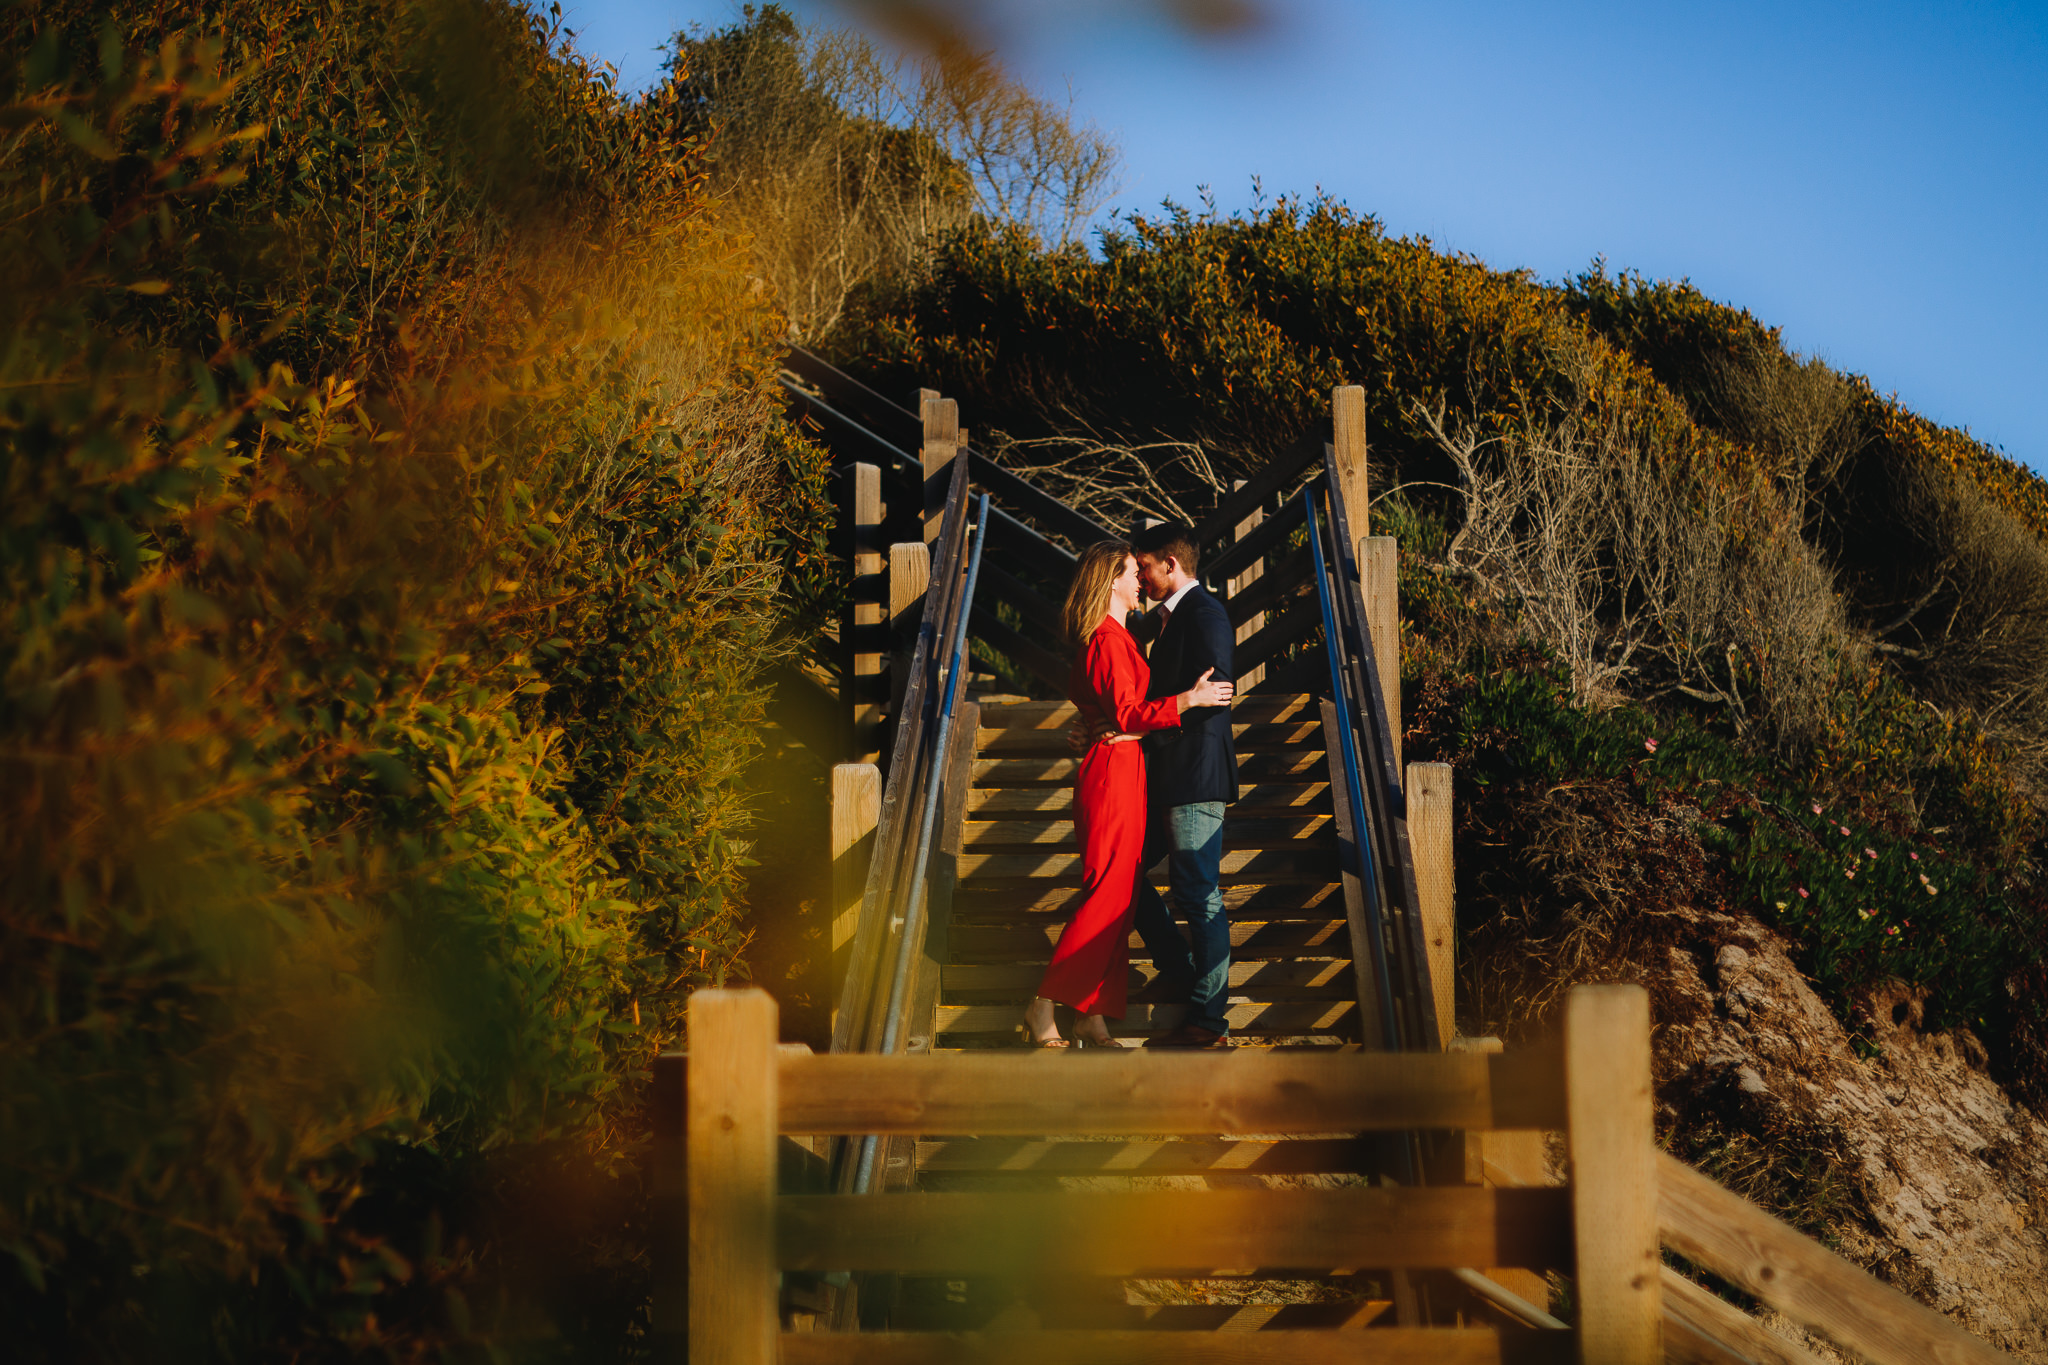 Archer Inspired Photography Carmel Beach California Wedding Engagement Lifestyle Anniversary Natural Light Photographer-10.jpg